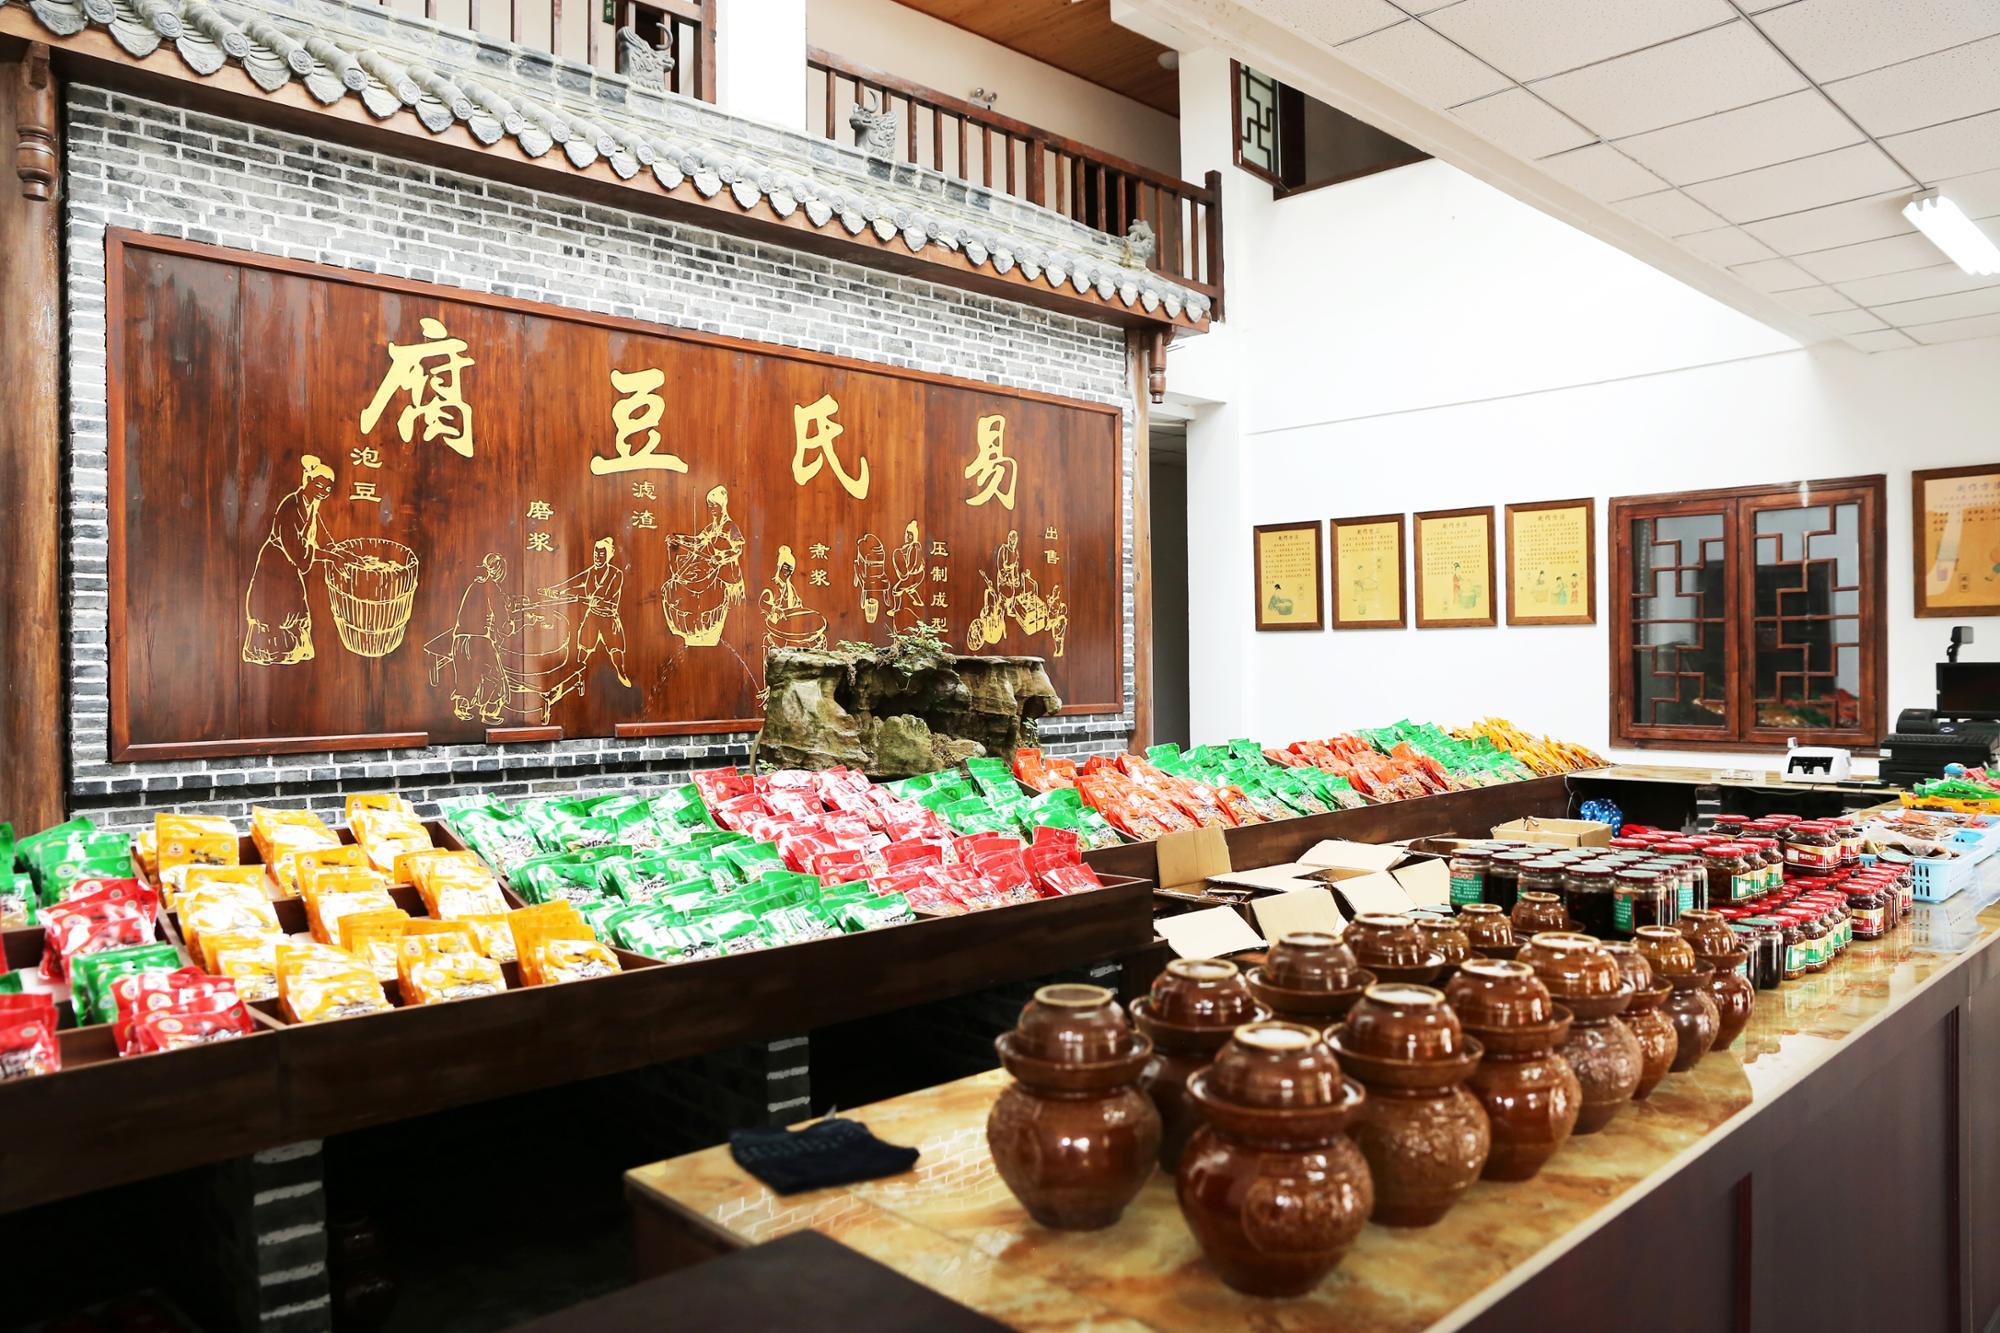 1600g Sufu,Chinese Health Food - Buy Sufu,Sufu Supplier,Health ...